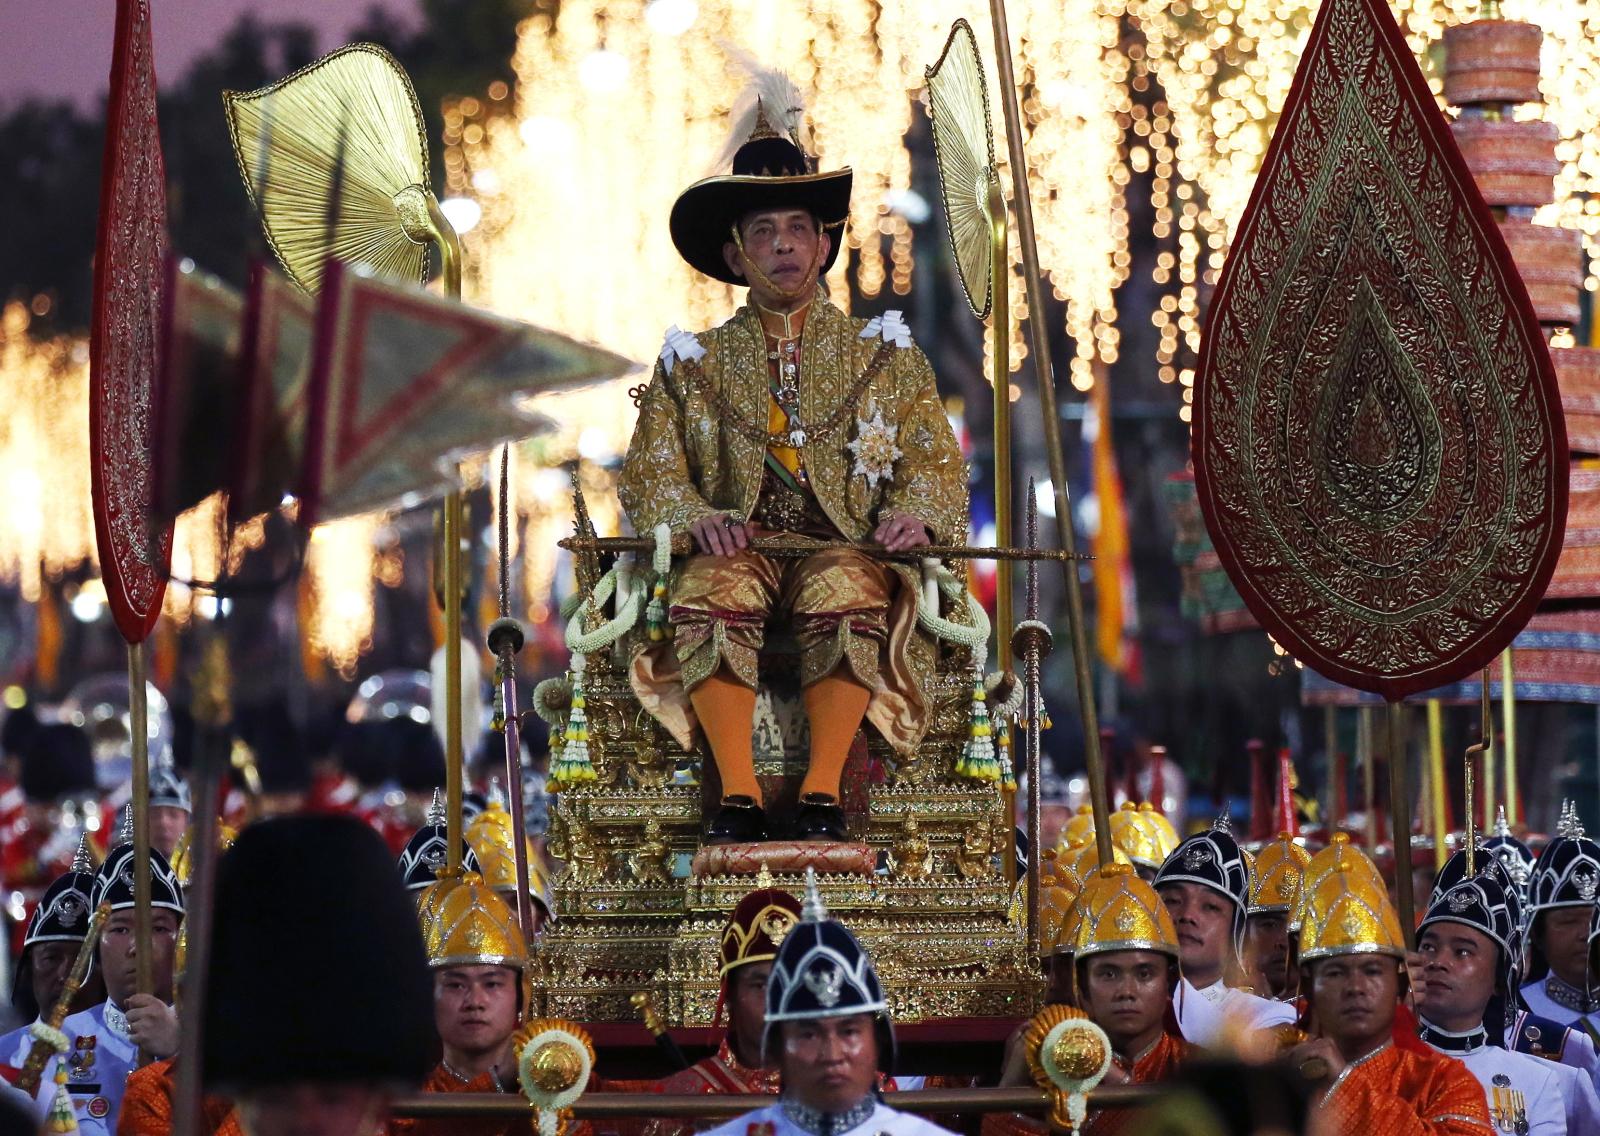 Koronacja w Tajlandii EPA/NARONG SANGNAK